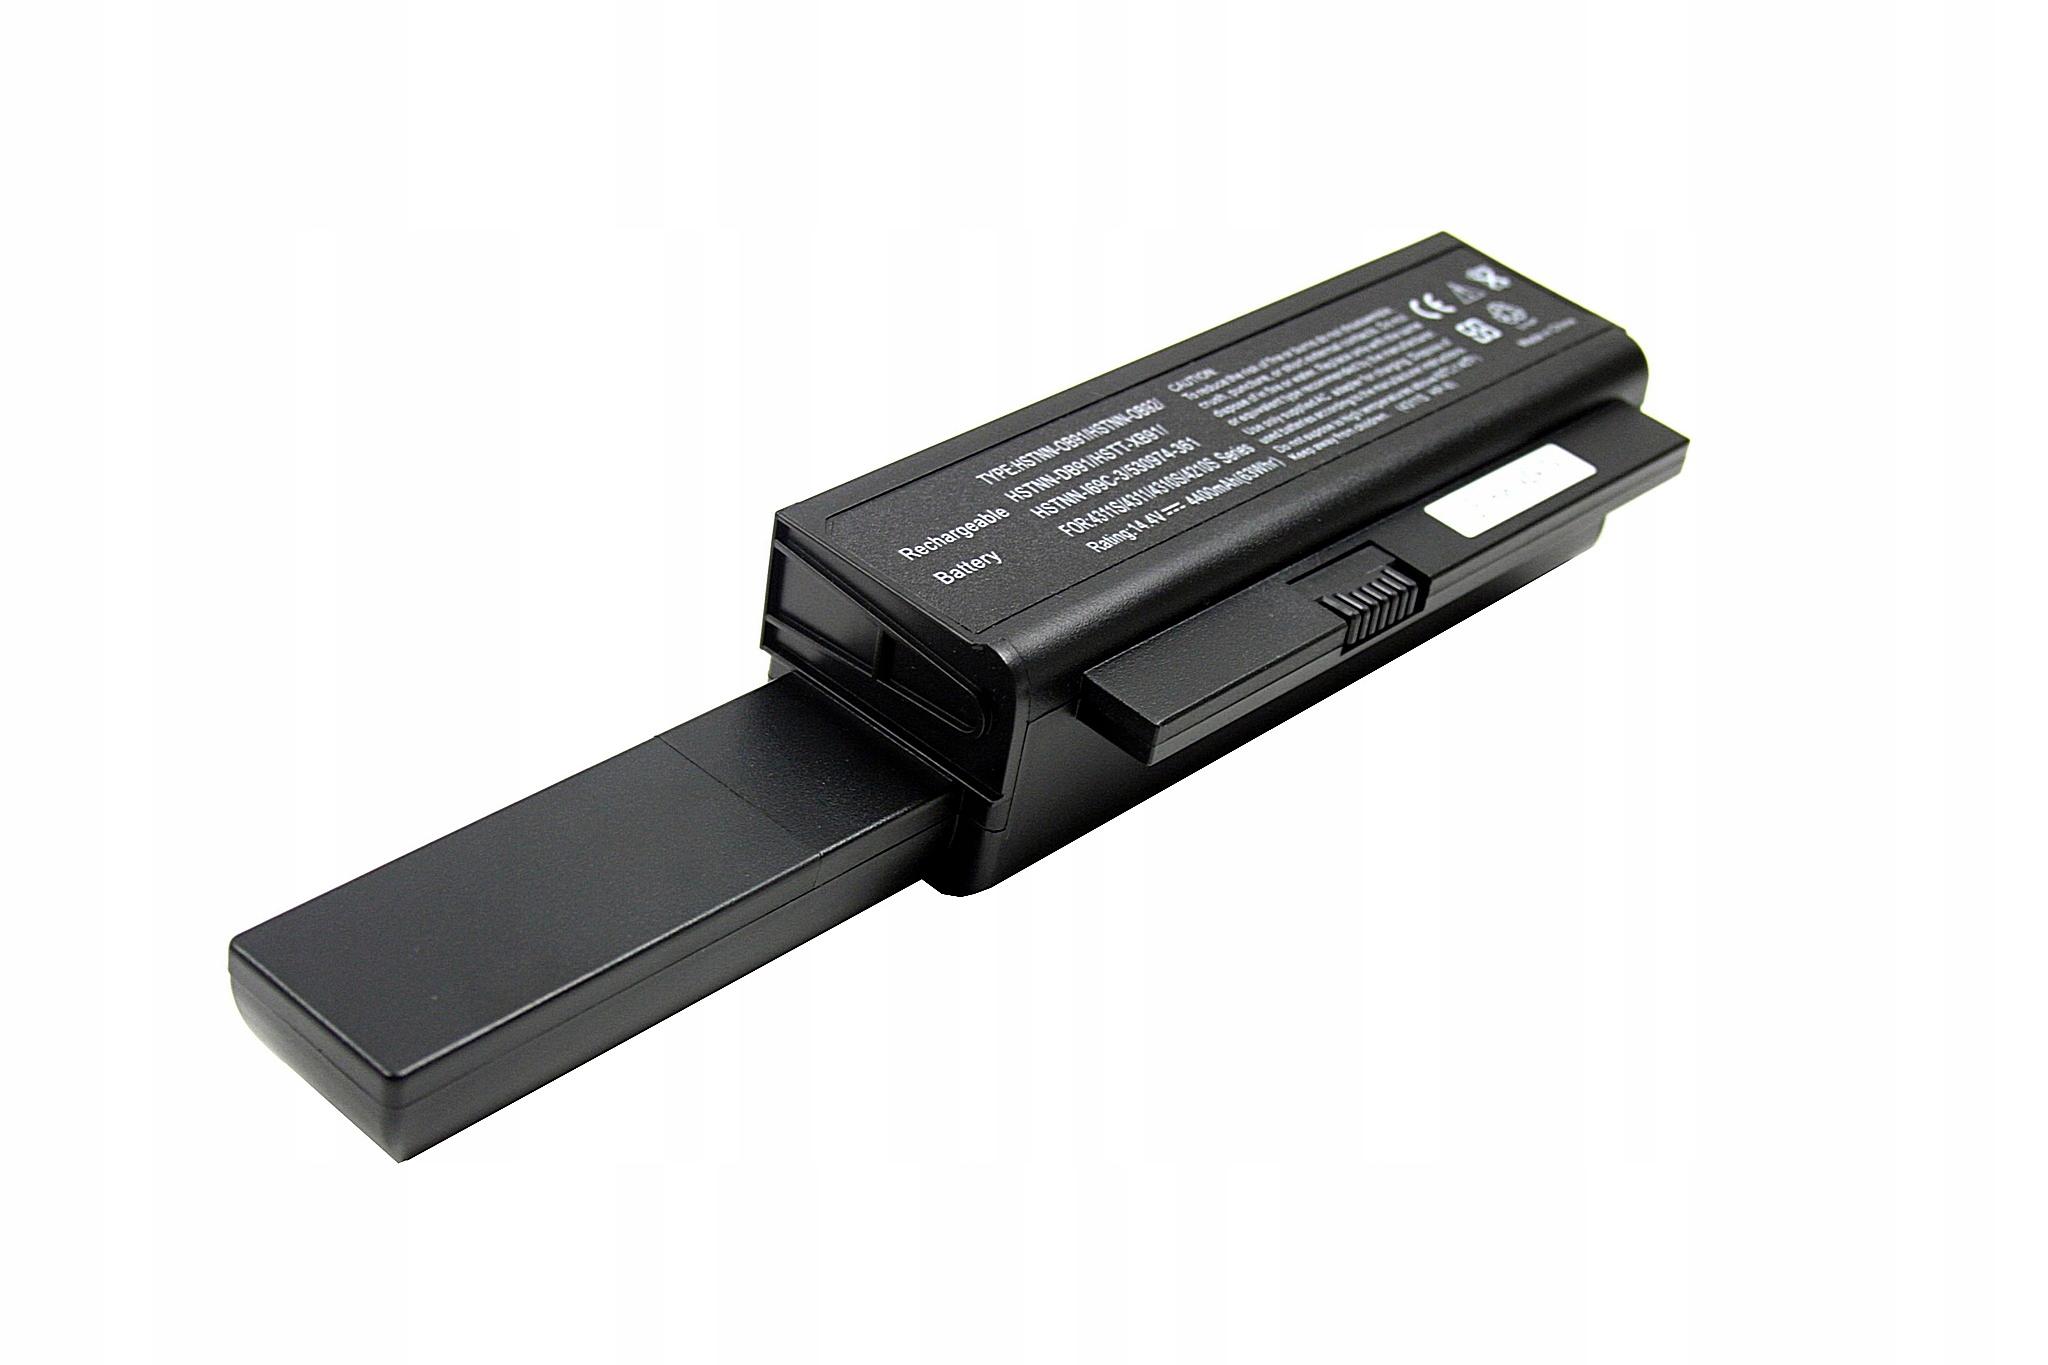 BATERIA AKUMULATOR HP PROBOOK 4310 4310S 4311 4311S - Baterie do laptopów